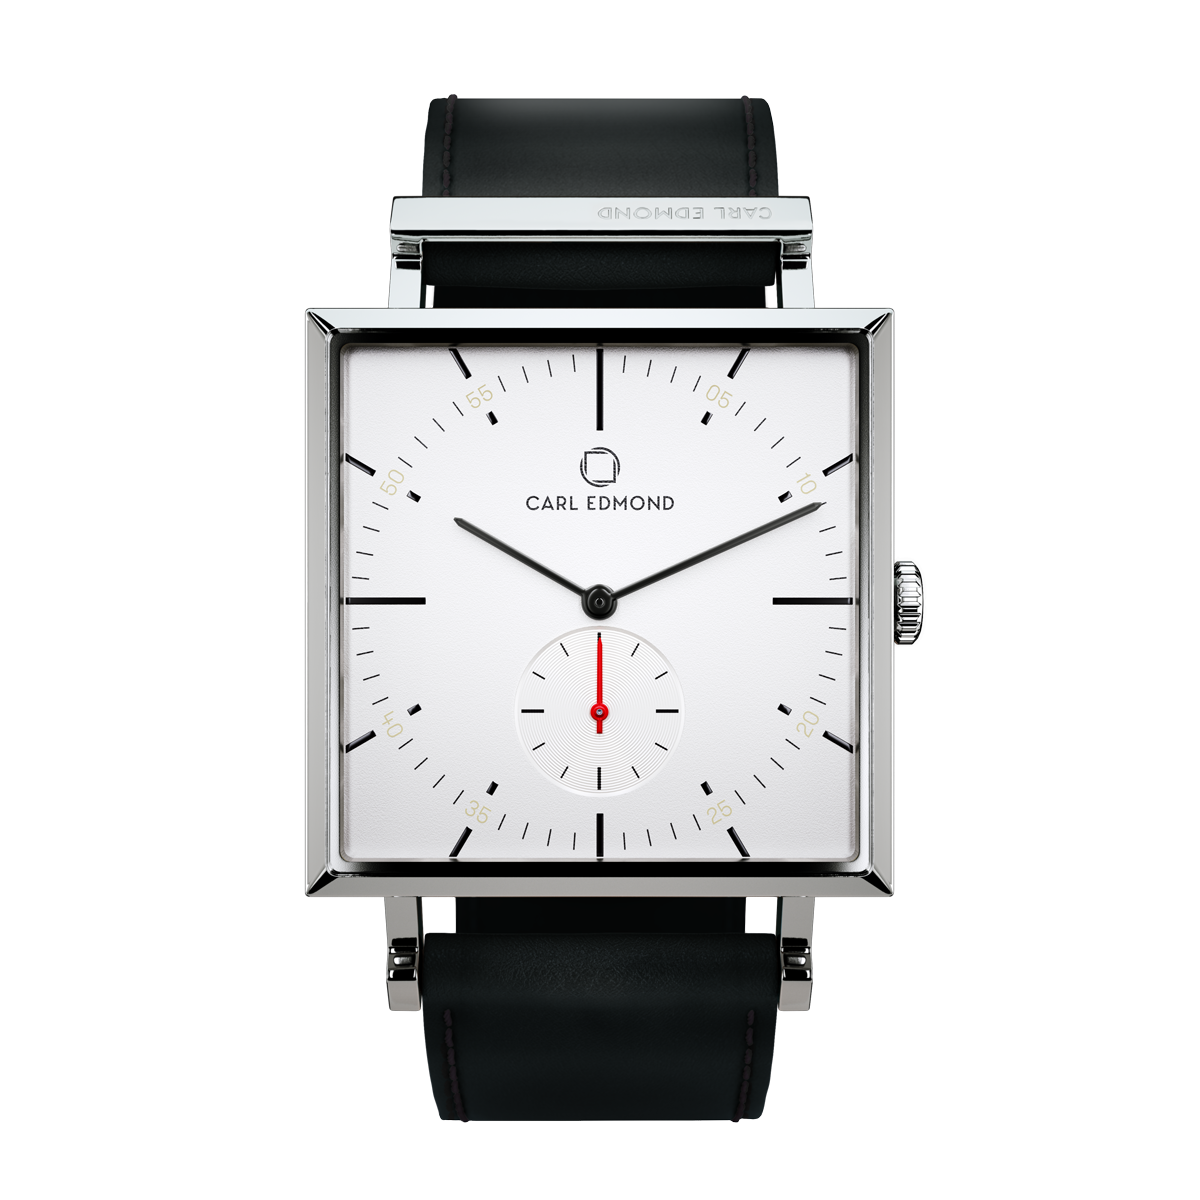 carl-edmond-granit-white-g3451-b21.png